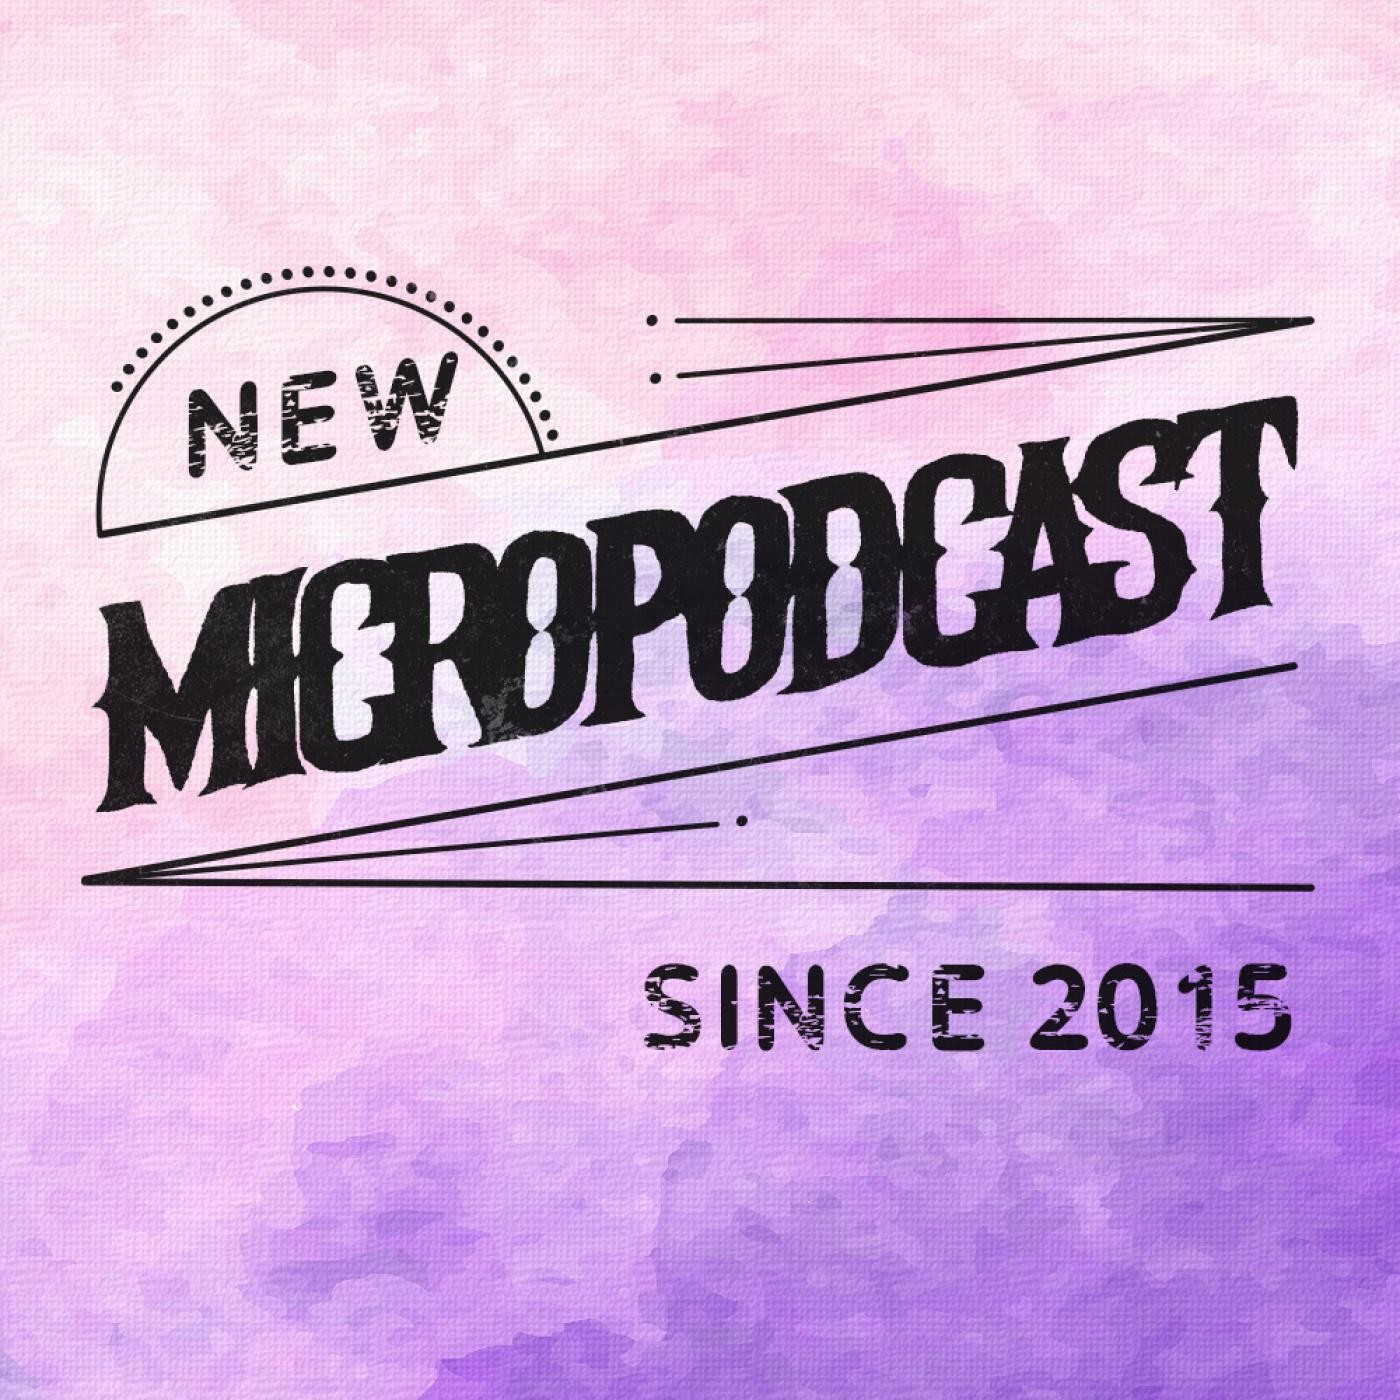 <![CDATA[Micropodcast]]>